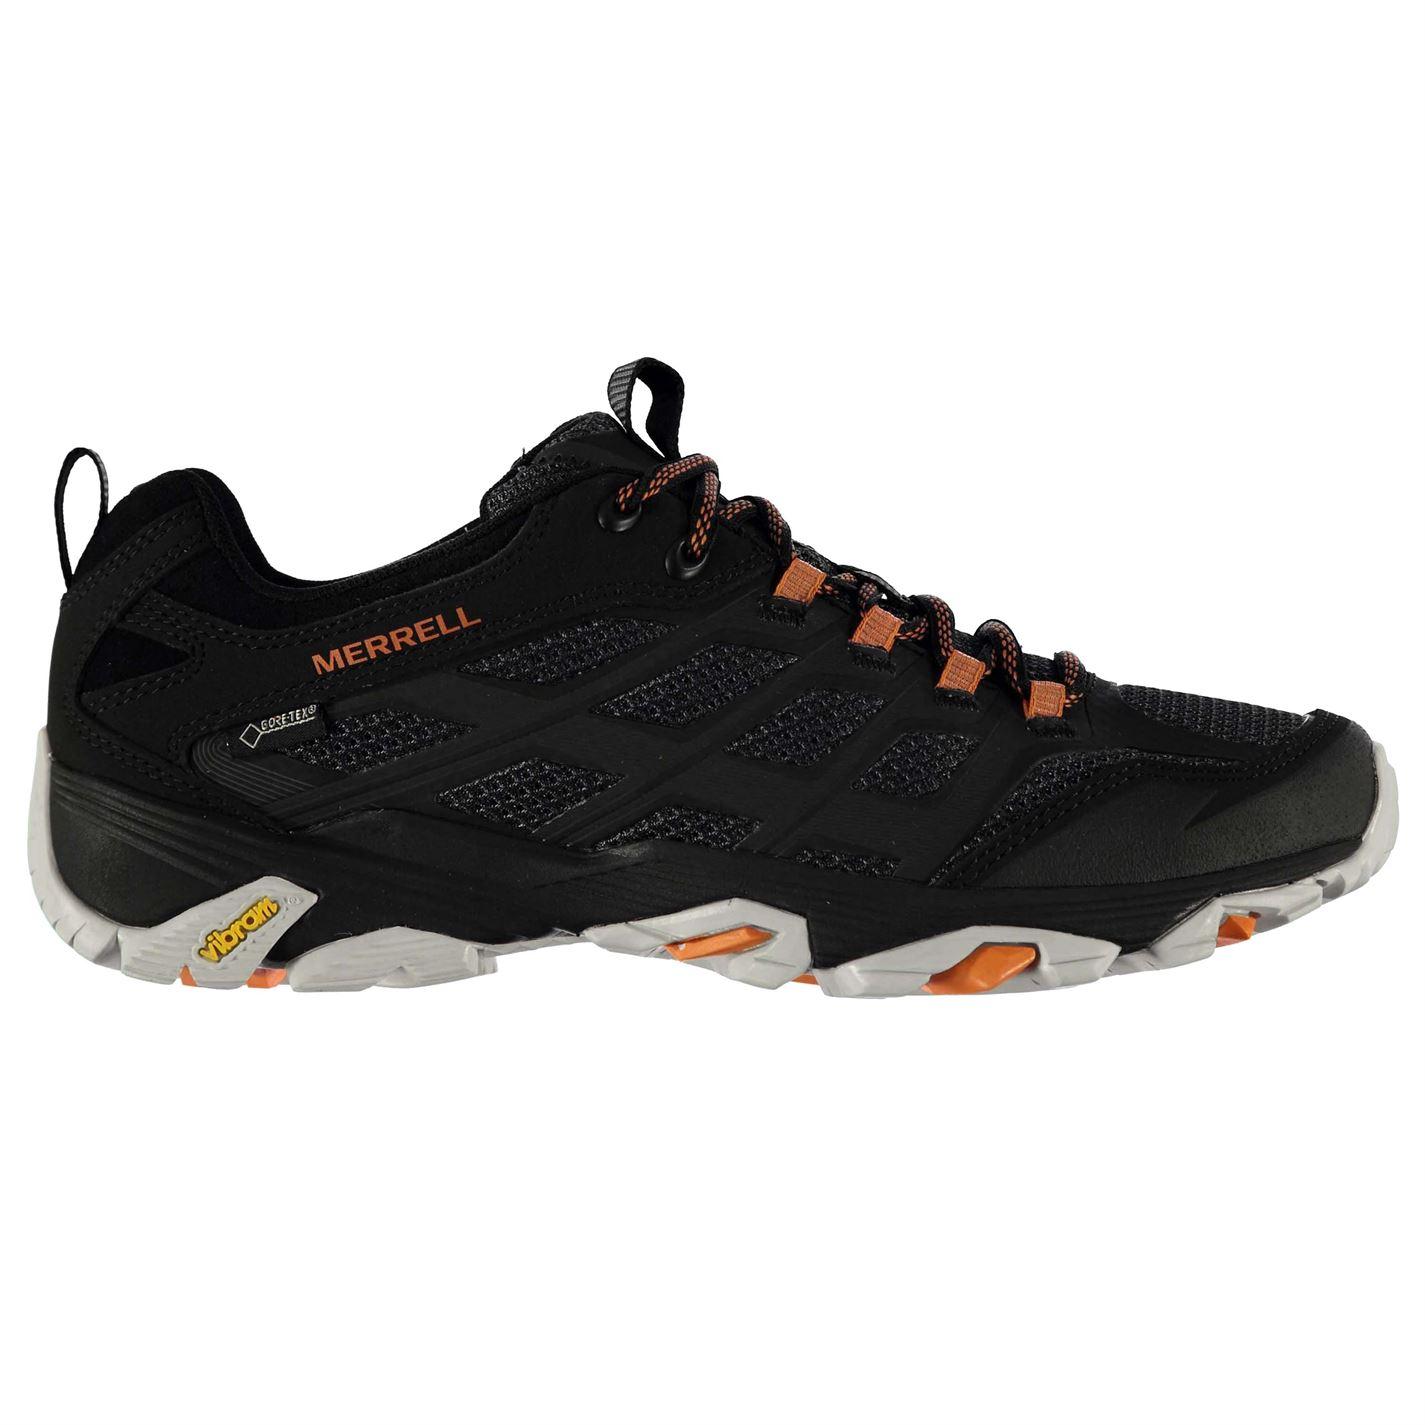 Merrell Moab FST Gore Tex Walking Shoes Mens